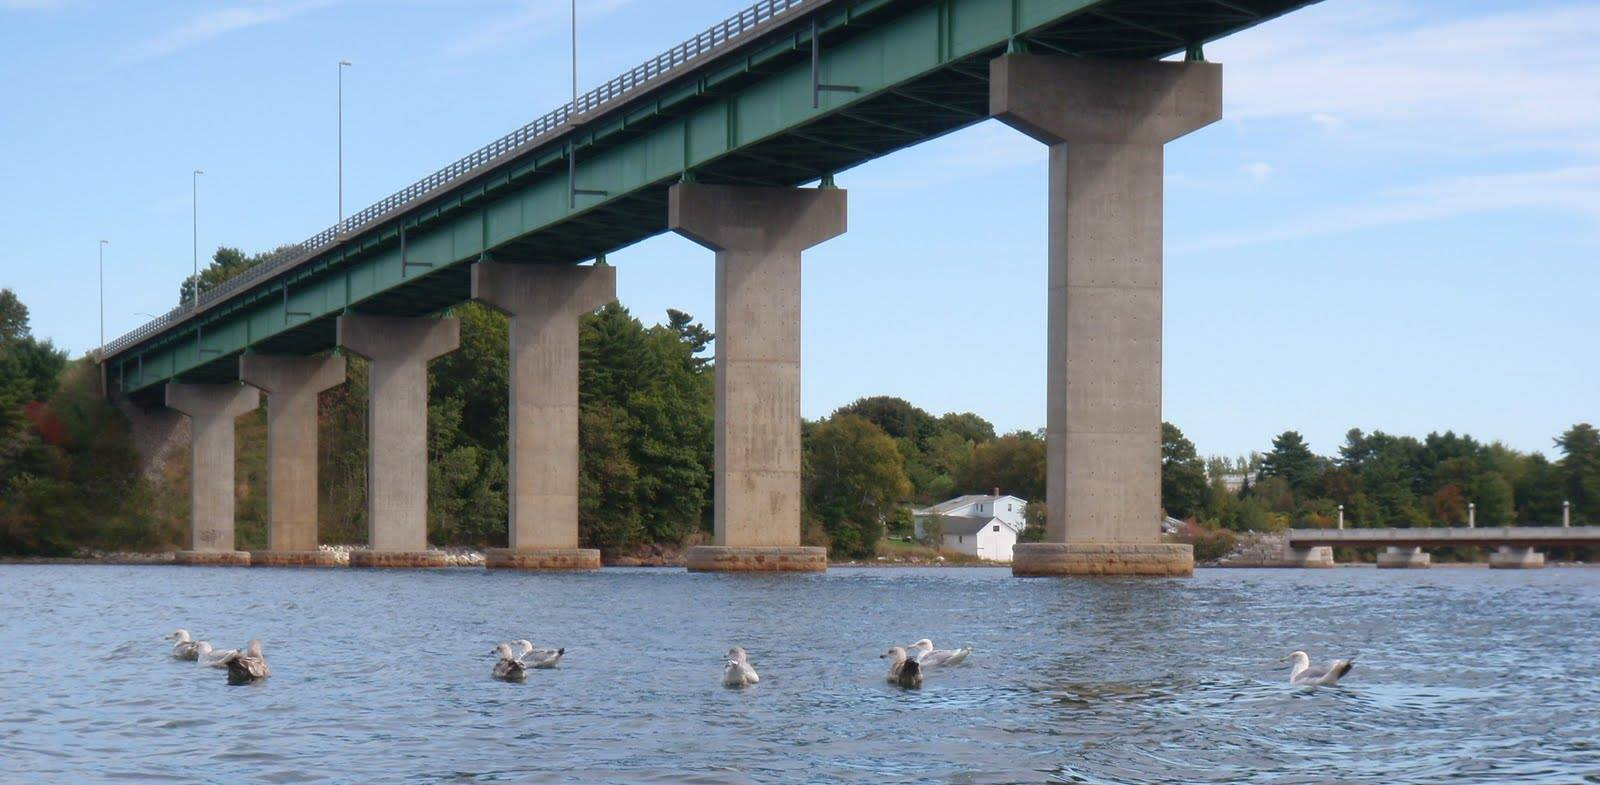 Passagassawakeag bridge Belfast Maine